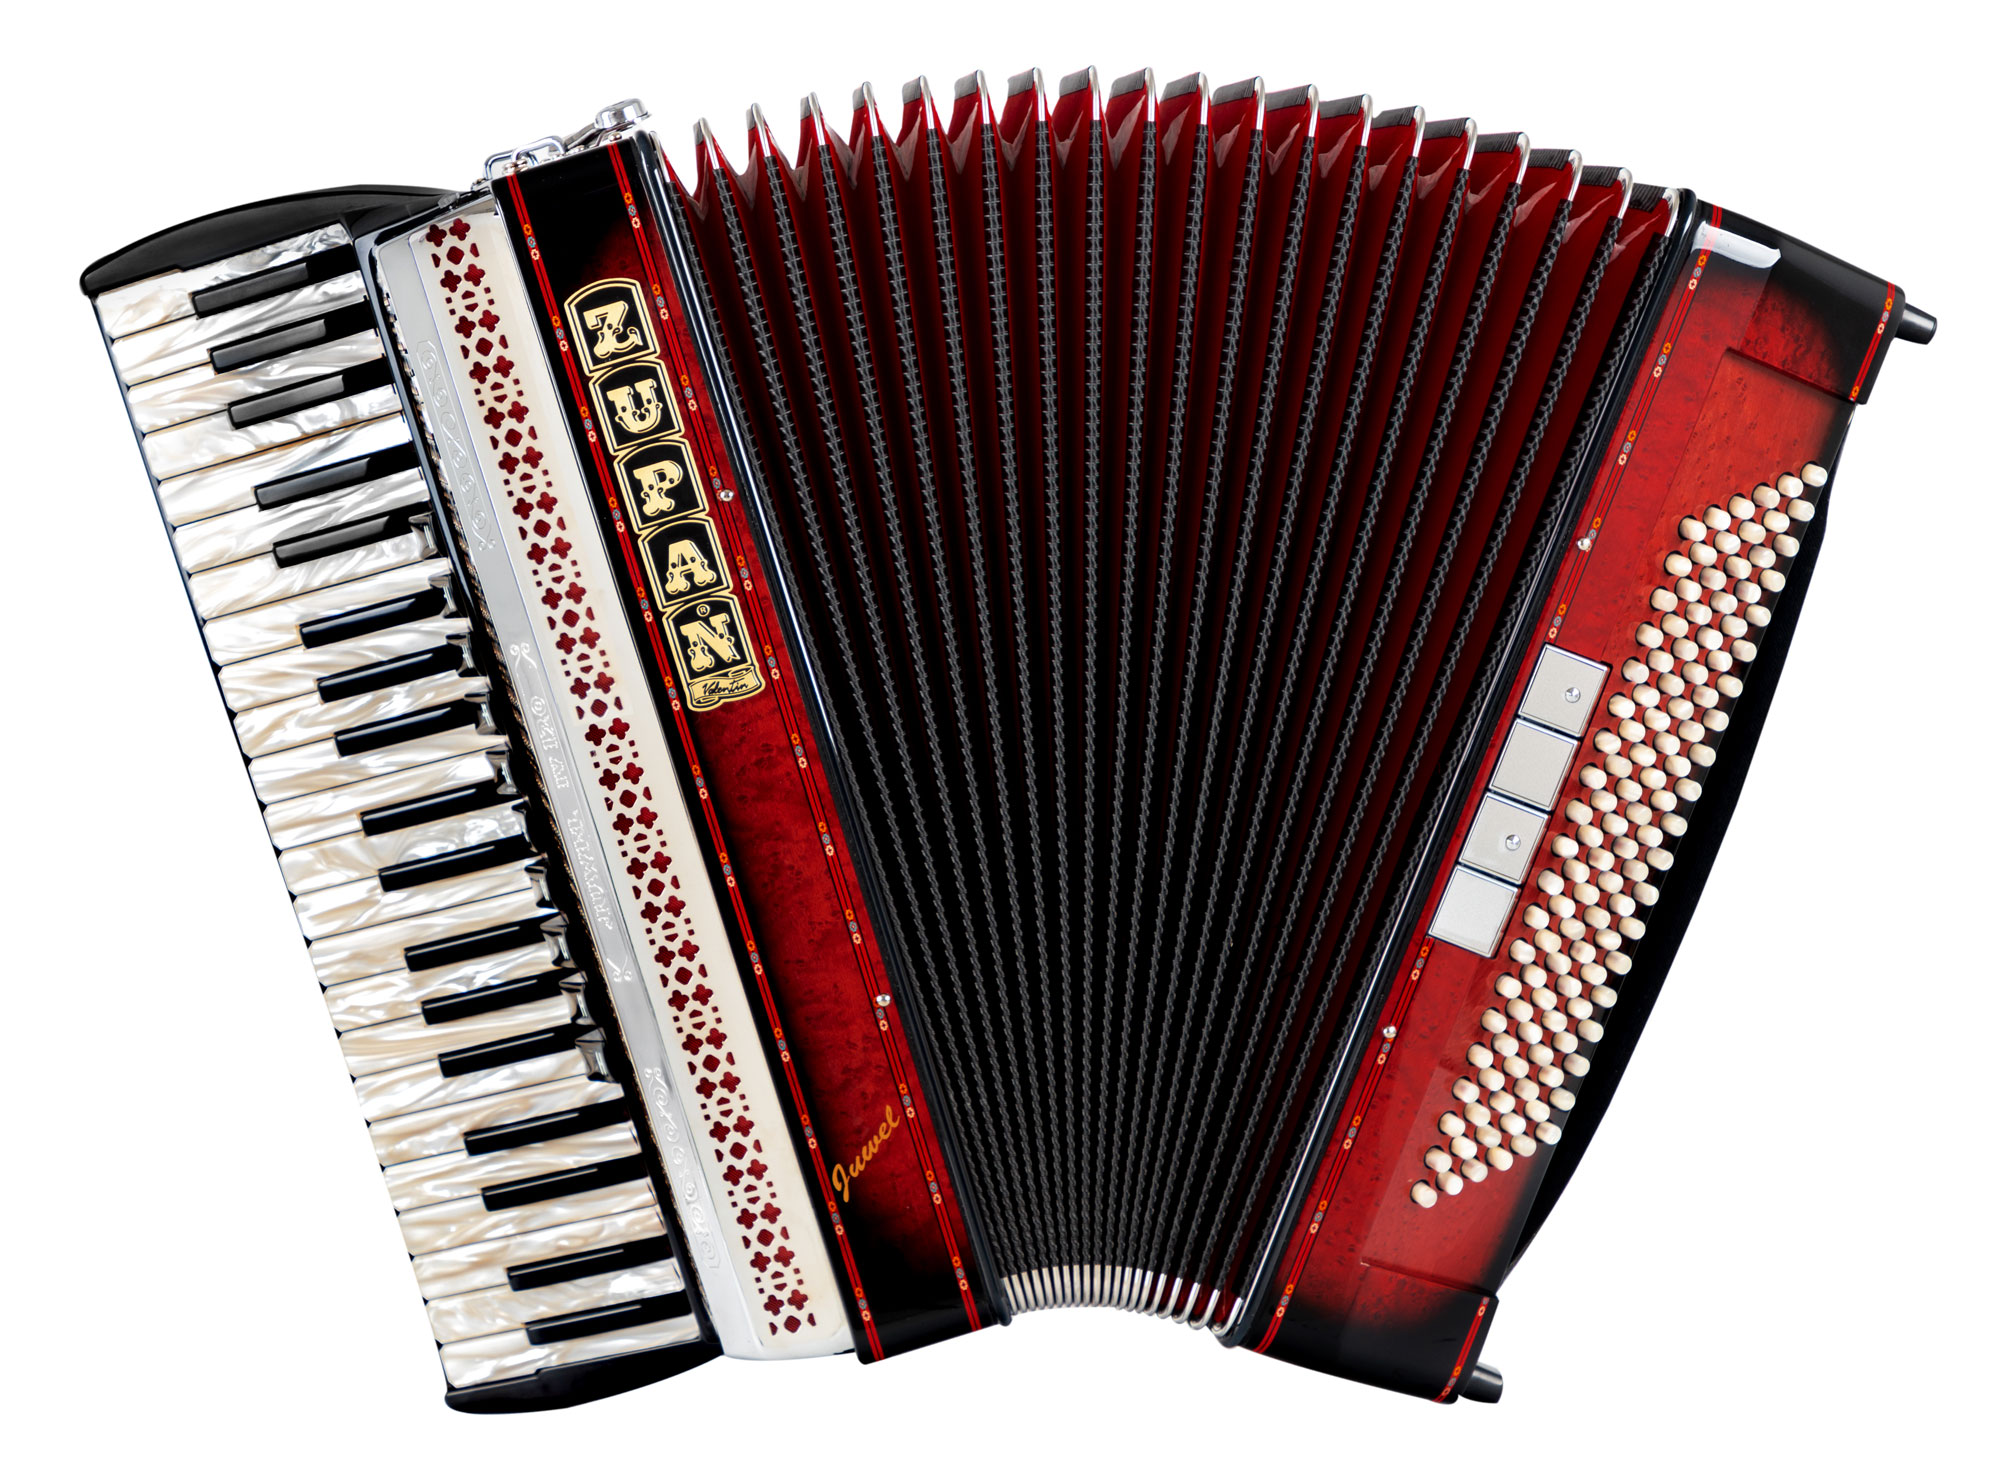 Akkordeons - Zupan Juwel IV 120 M Akkordeon Shadow Red Retoure (Zustand wie neu) - Onlineshop Musikhaus Kirstein